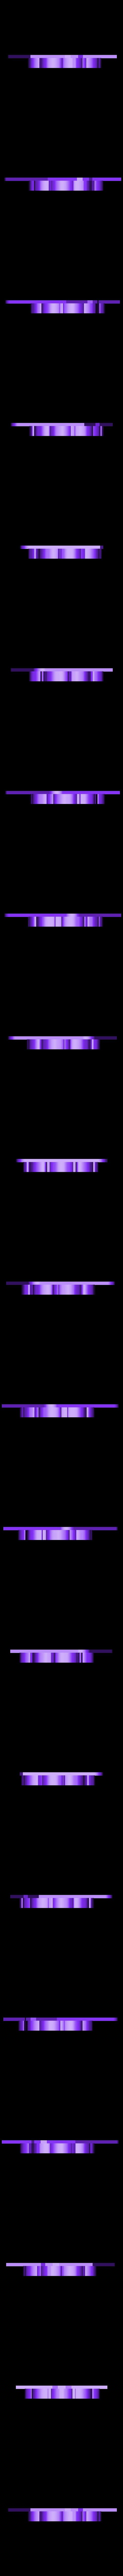 TAZ_5_Raspberry_Pi_3_Mount_-_Pi_Logo_Red.stl Download free STL file TAZ 5 Raspberry Pi 2 / 3 Main Box Extension • 3D print template, crprinting